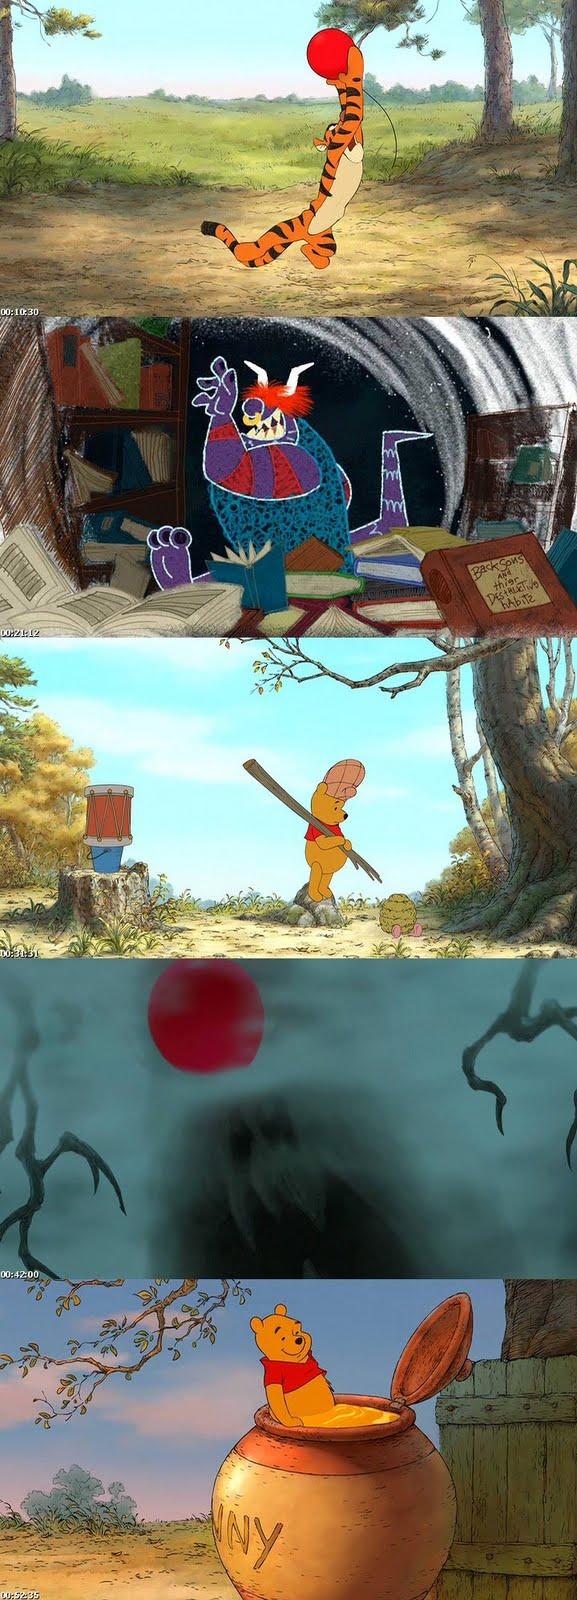 winnie the pooh 2011 dvdrip 250mbhigh qualitydownload